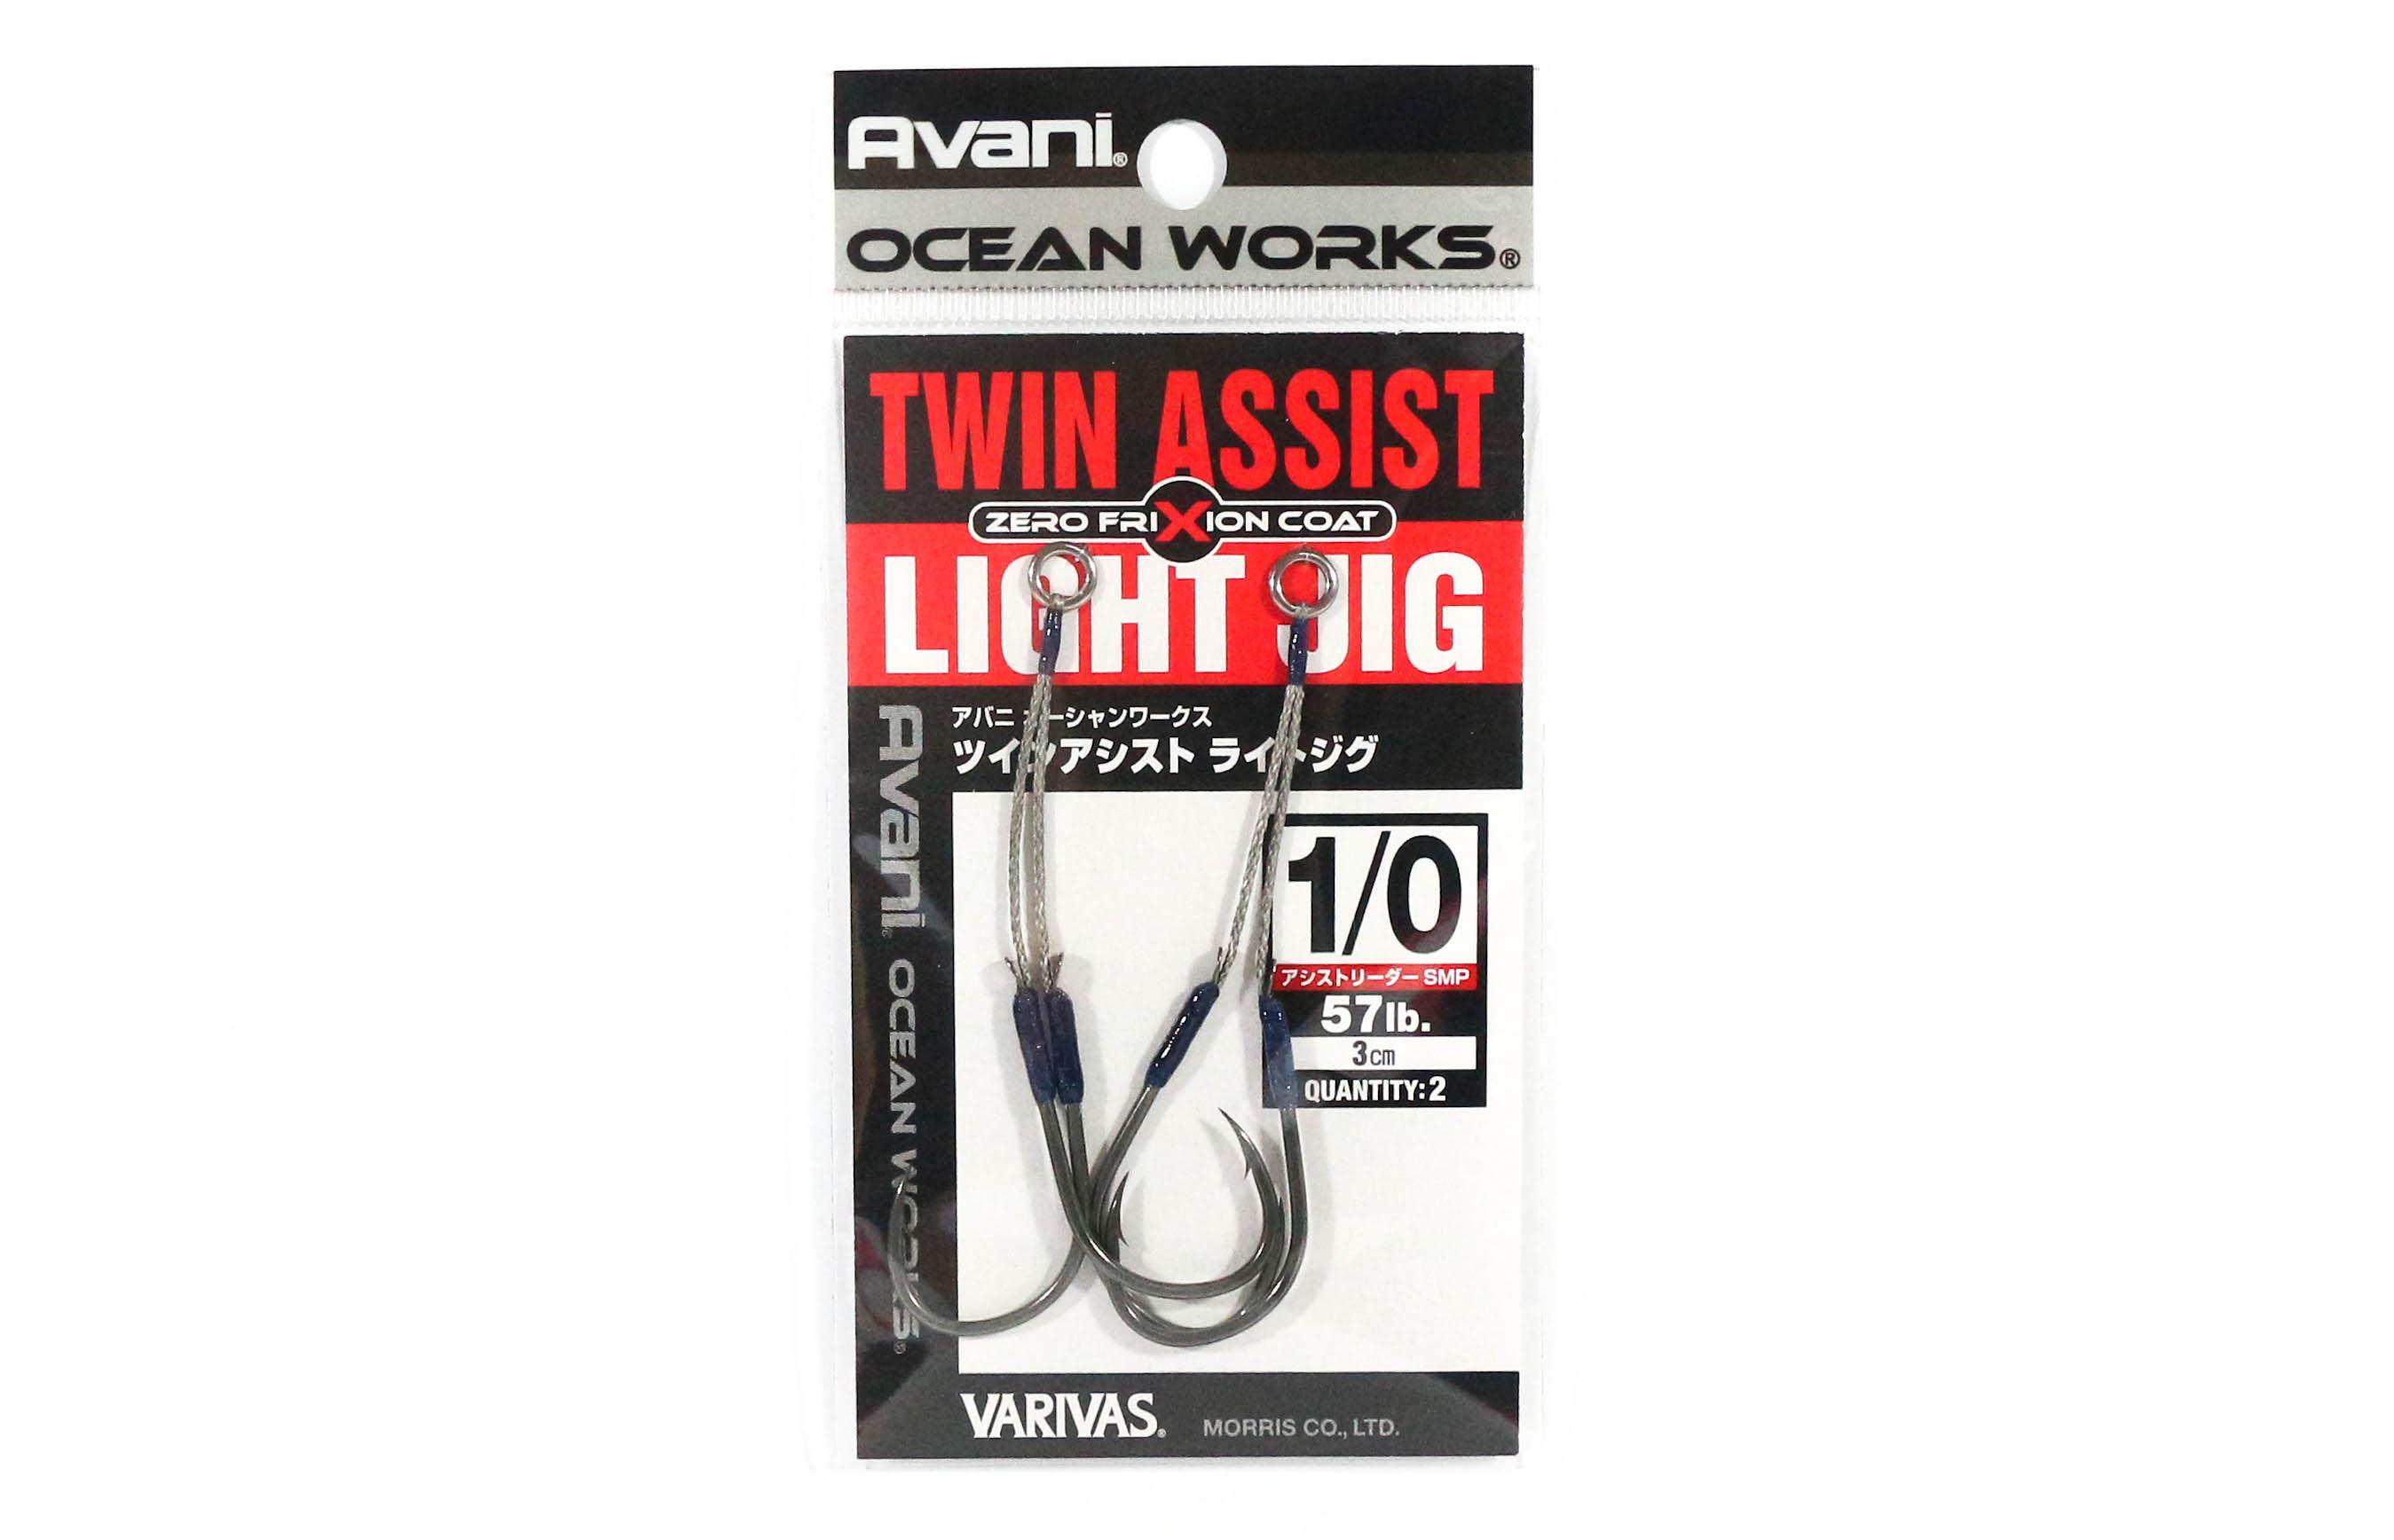 Varivas AH-60 Ocean Works Twin Assist Light Jig Size 1/0 - 3cm (4537)